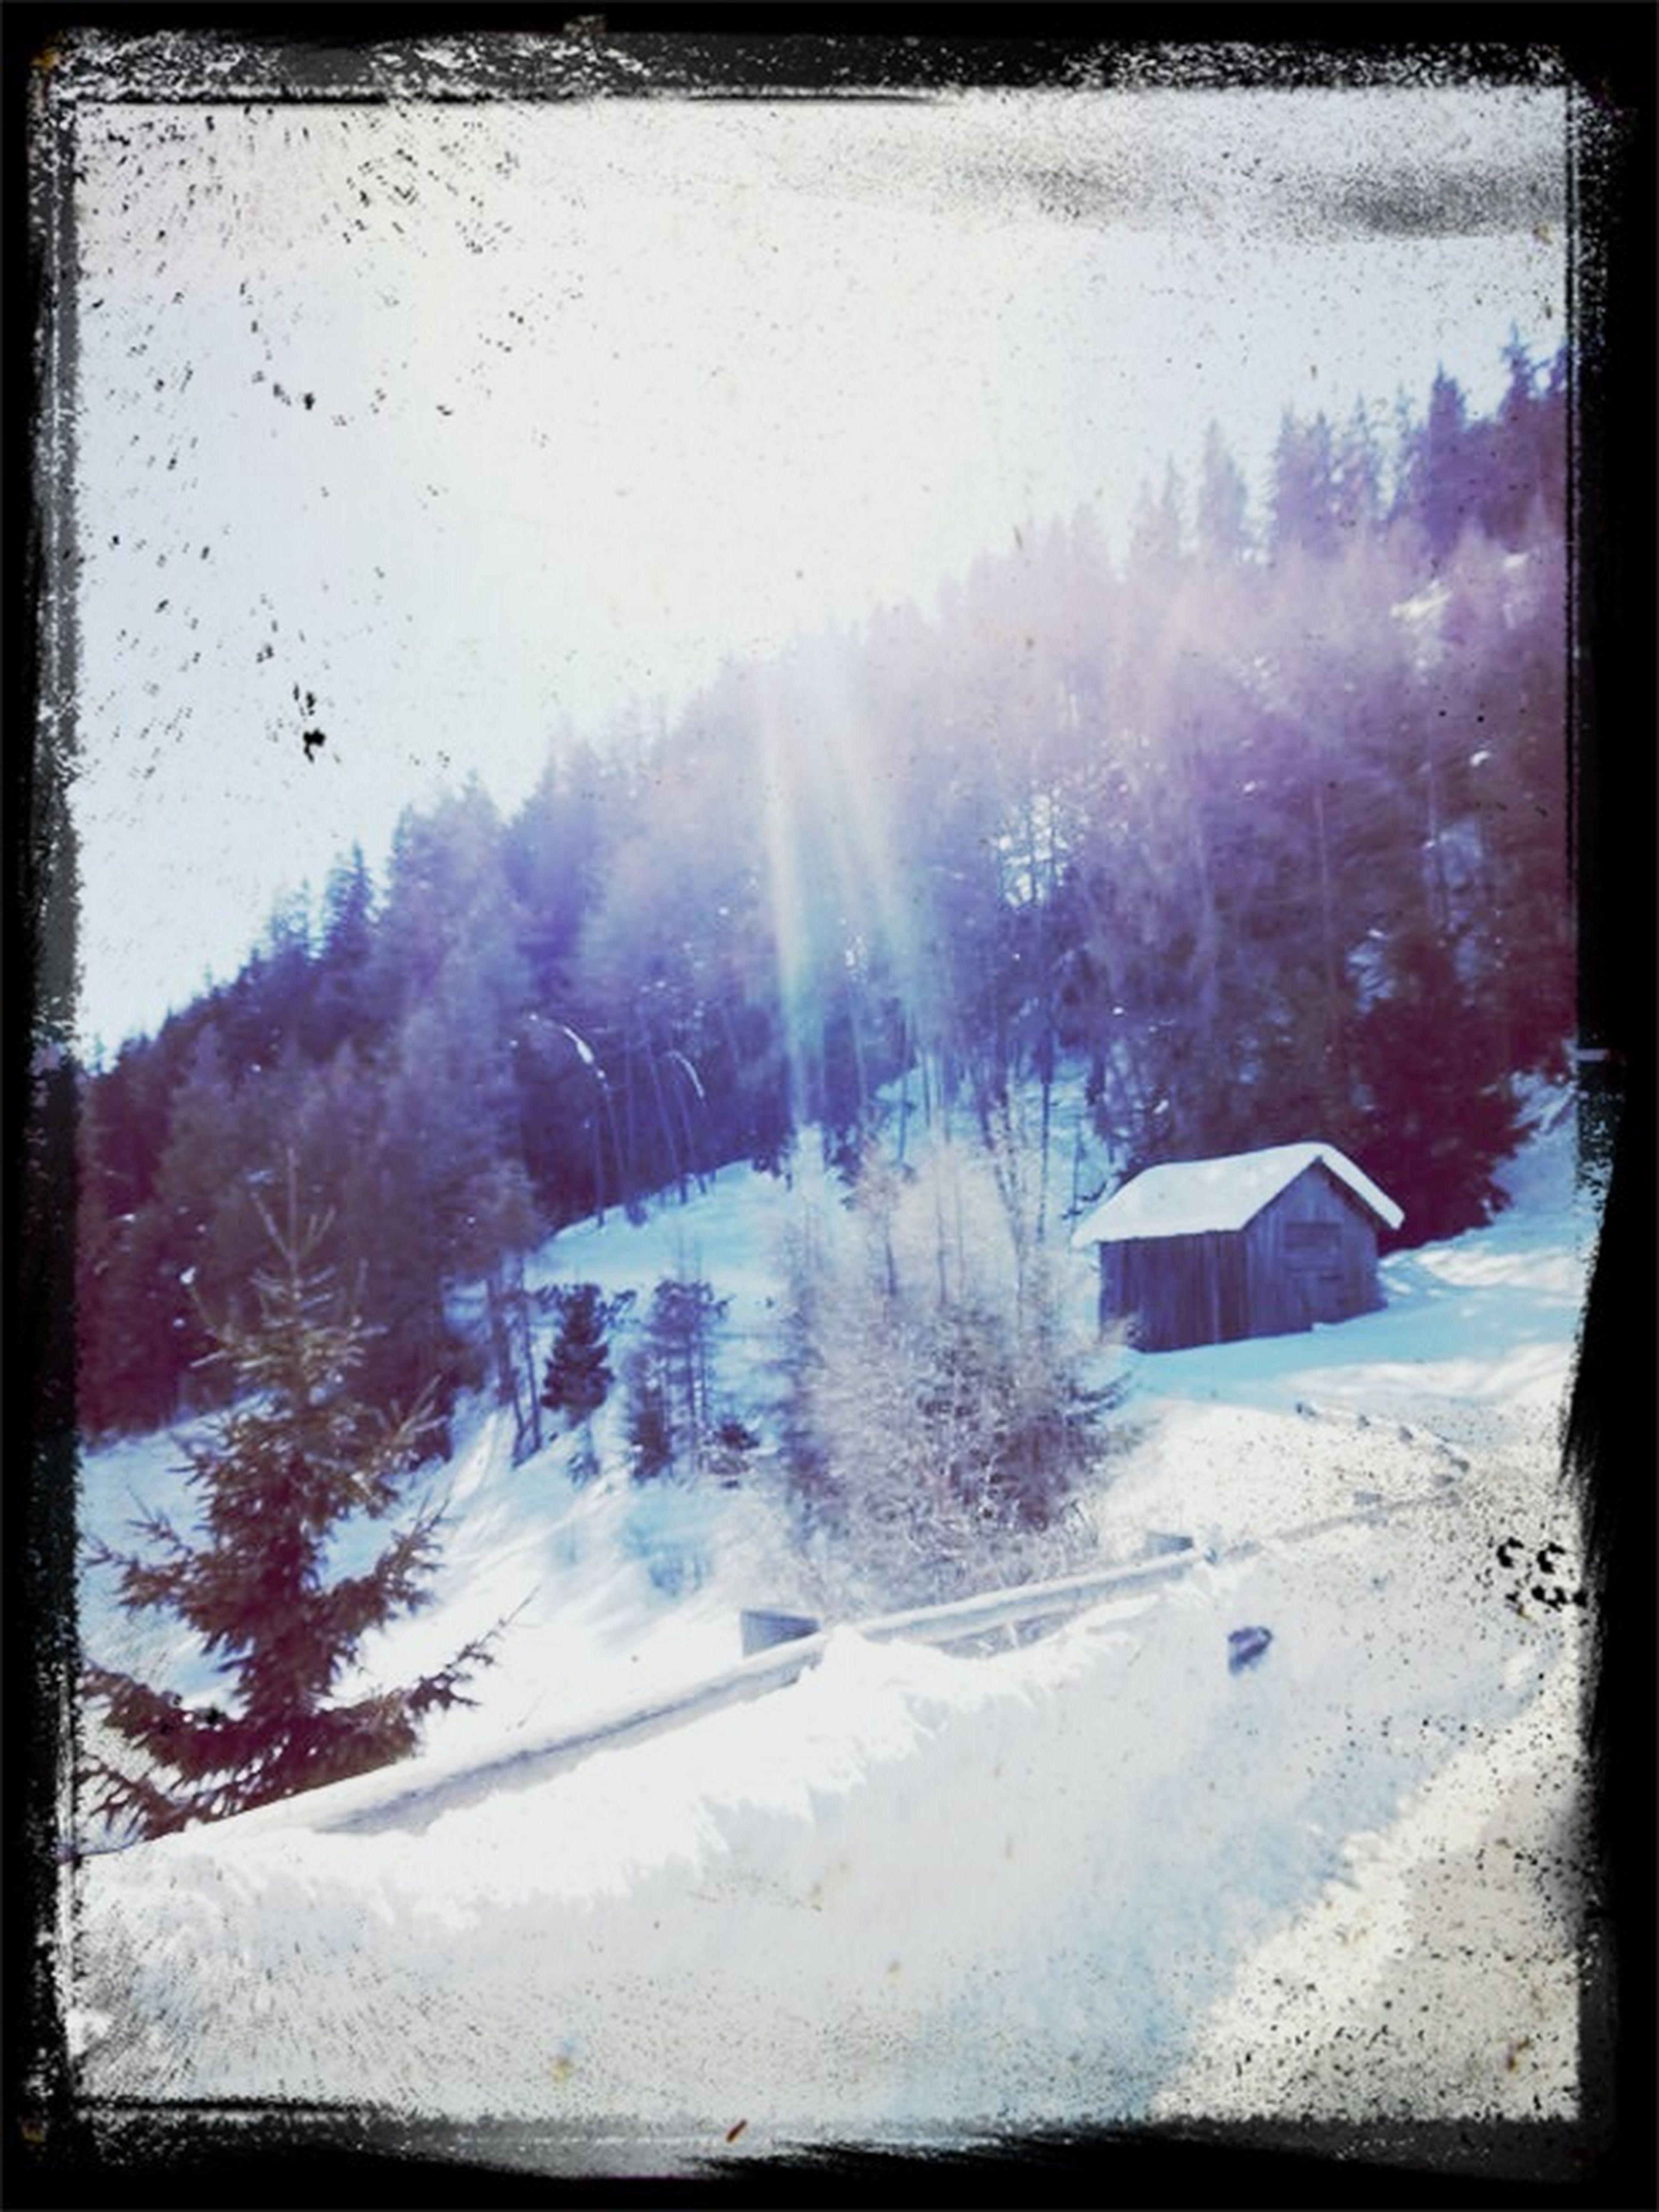 Snow ❄ Sun Beautiful View ❤ Winter Wonderland